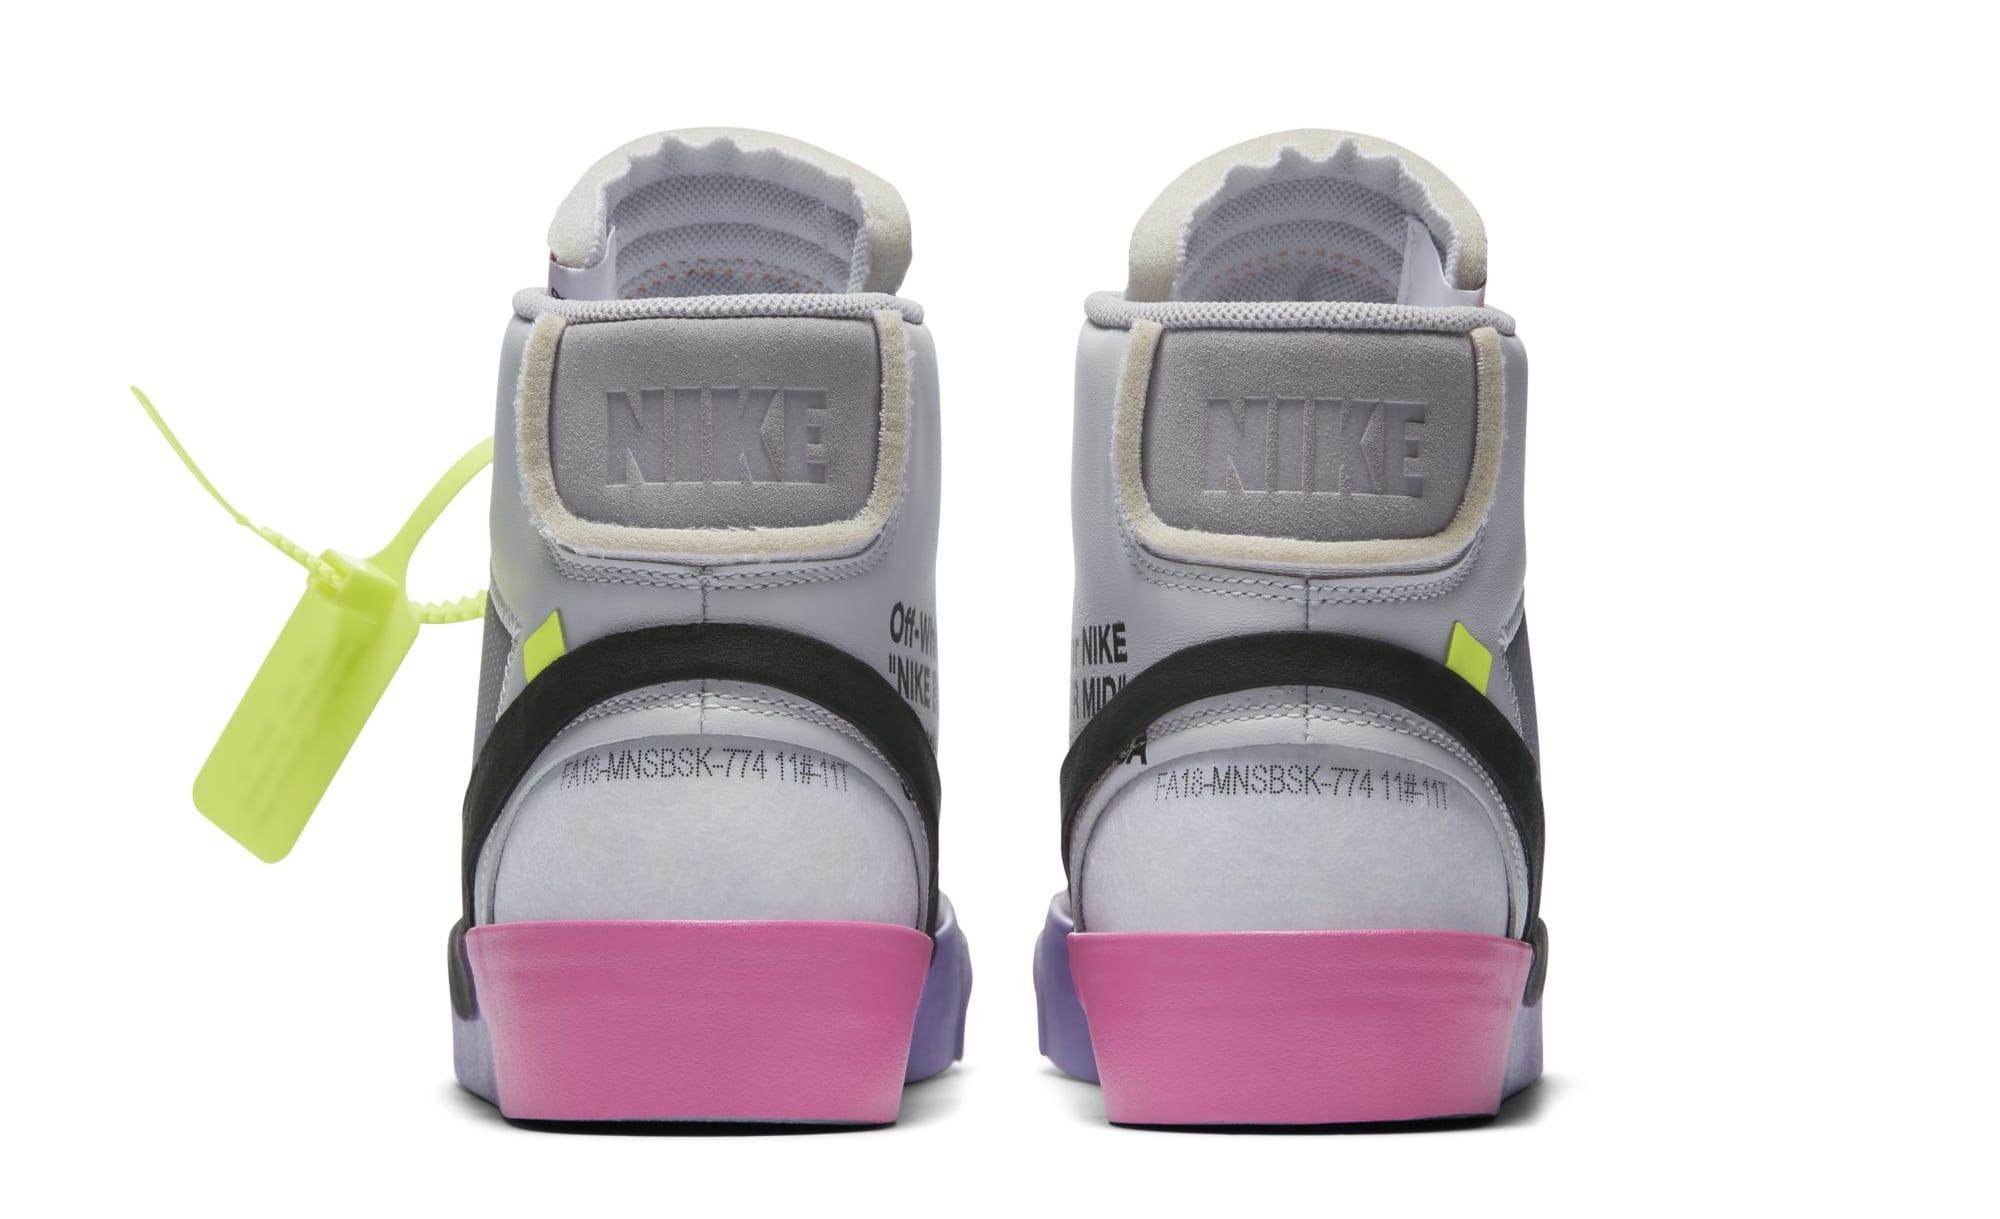 Serena Williams x Off-White x Nike Blazer Mid 'Queen' AA3832-002 (Heel)